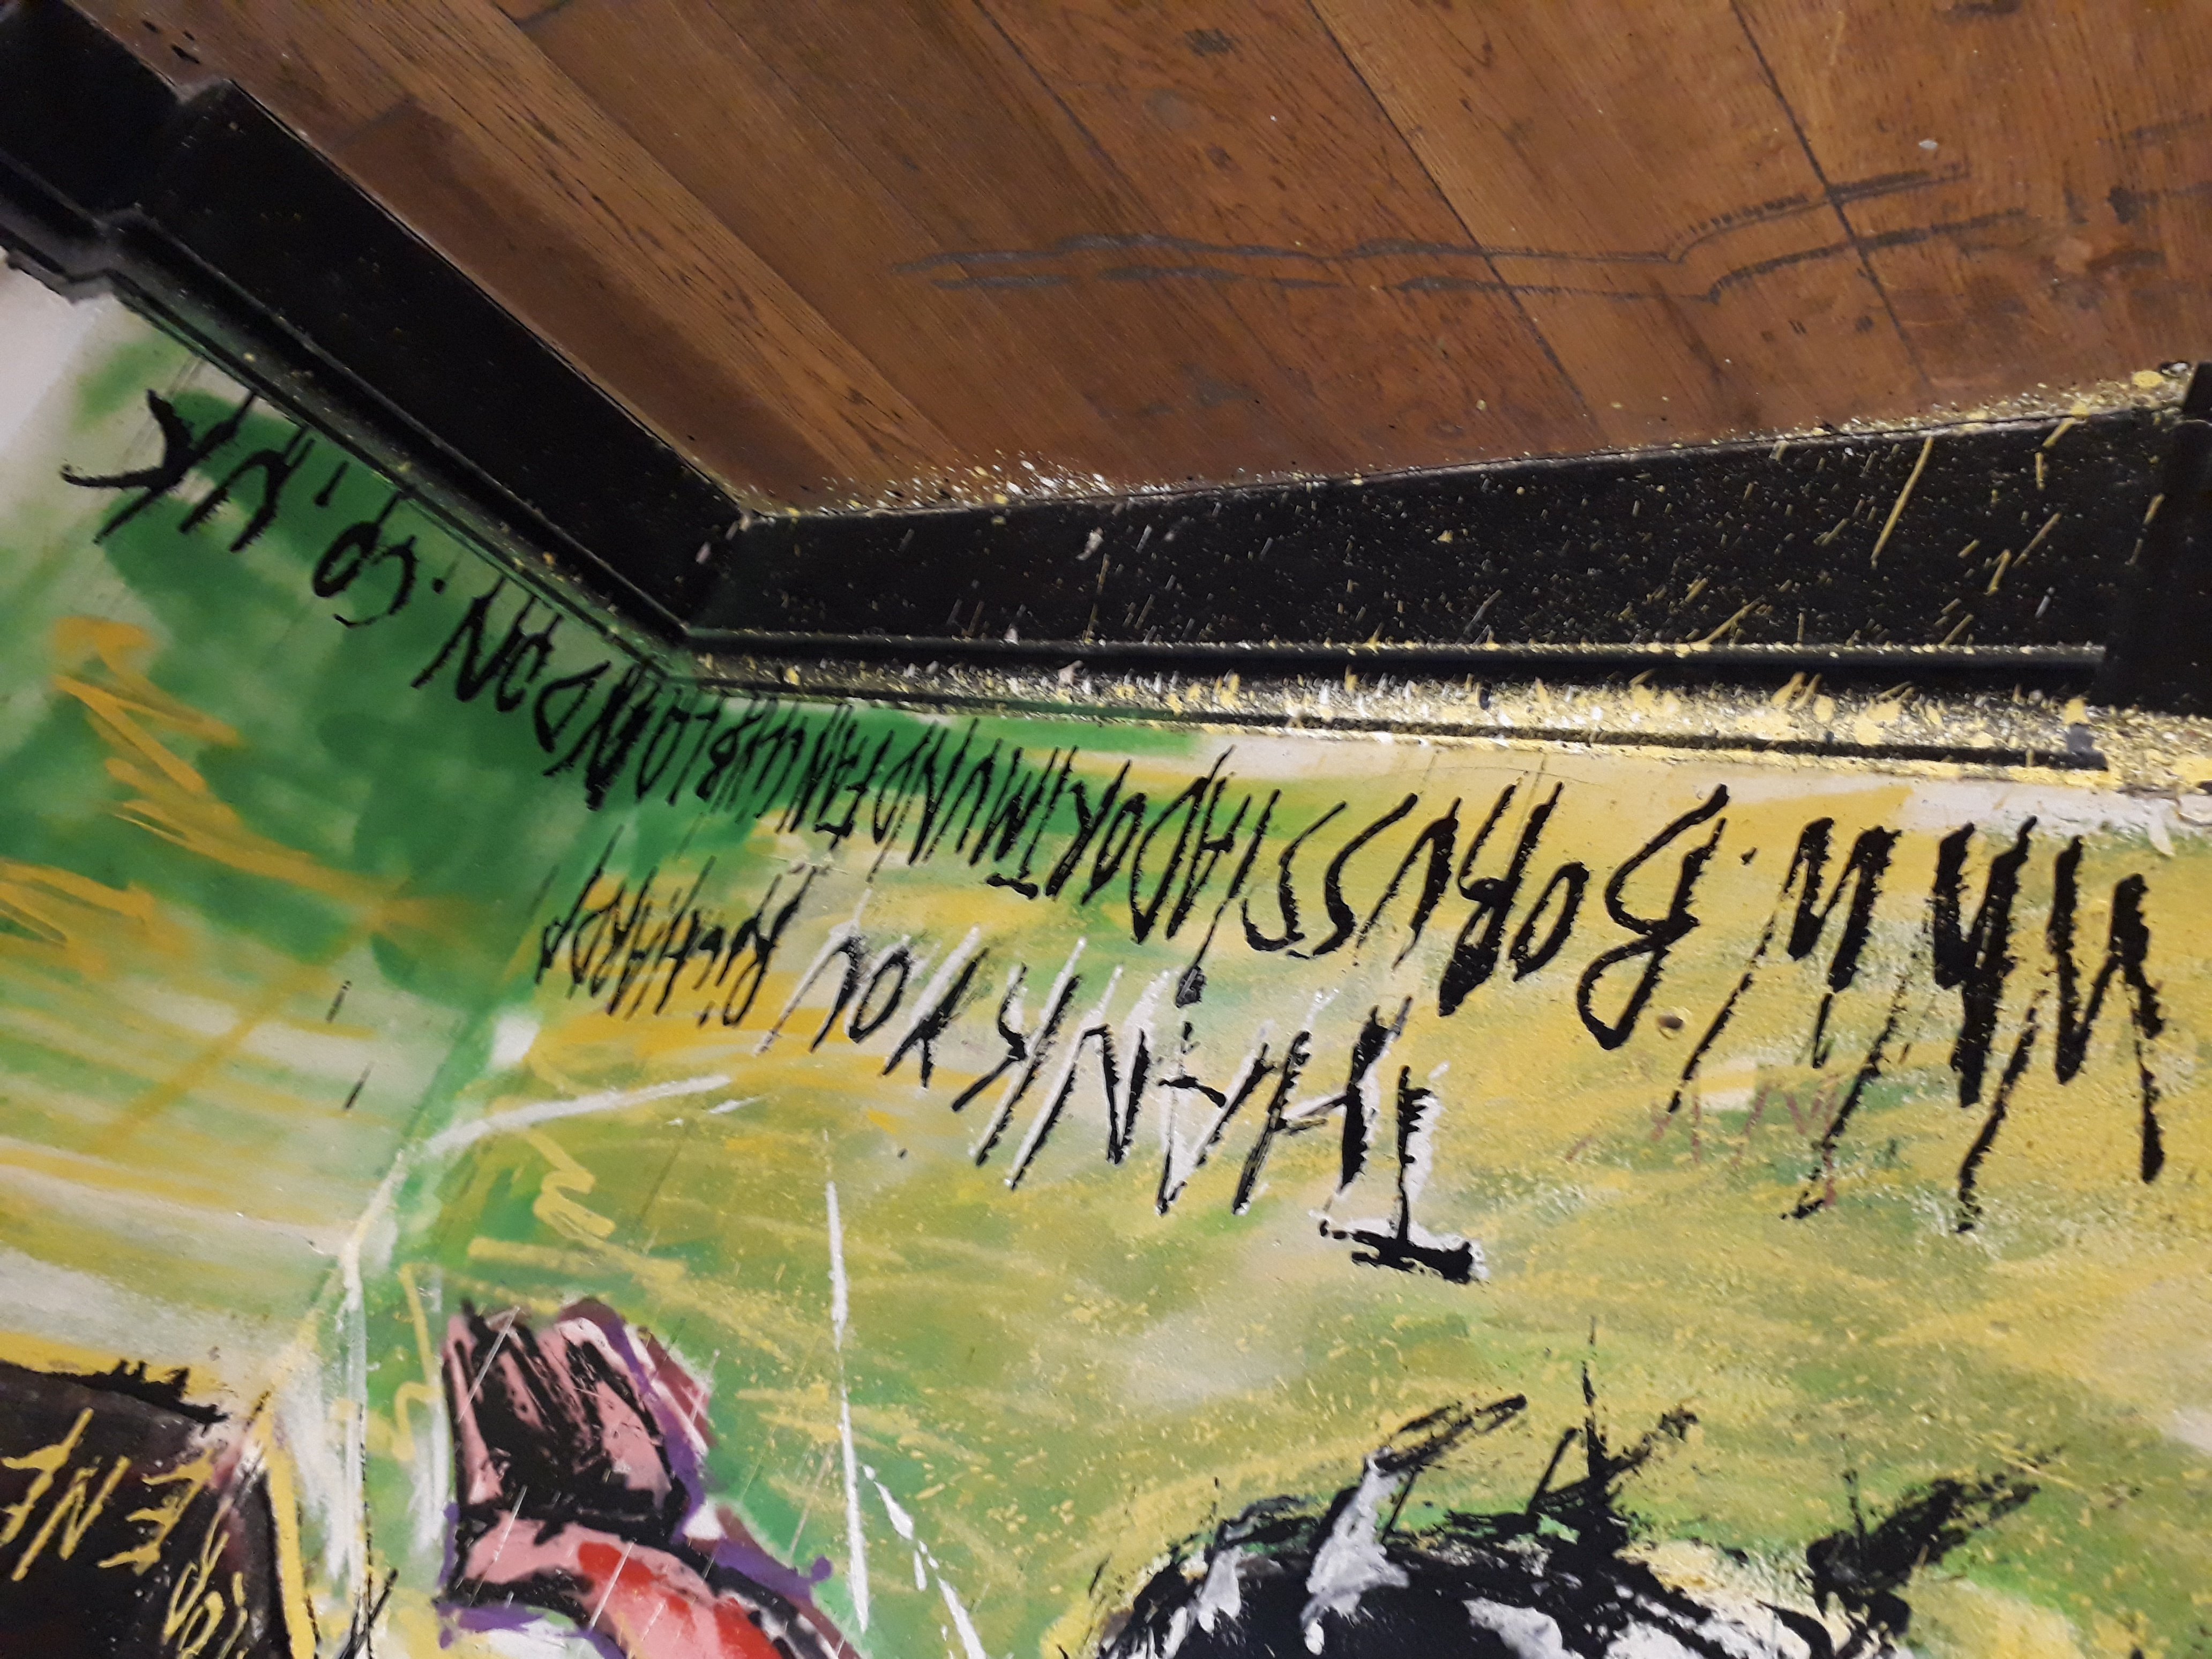 BVB 09 THANK YOU